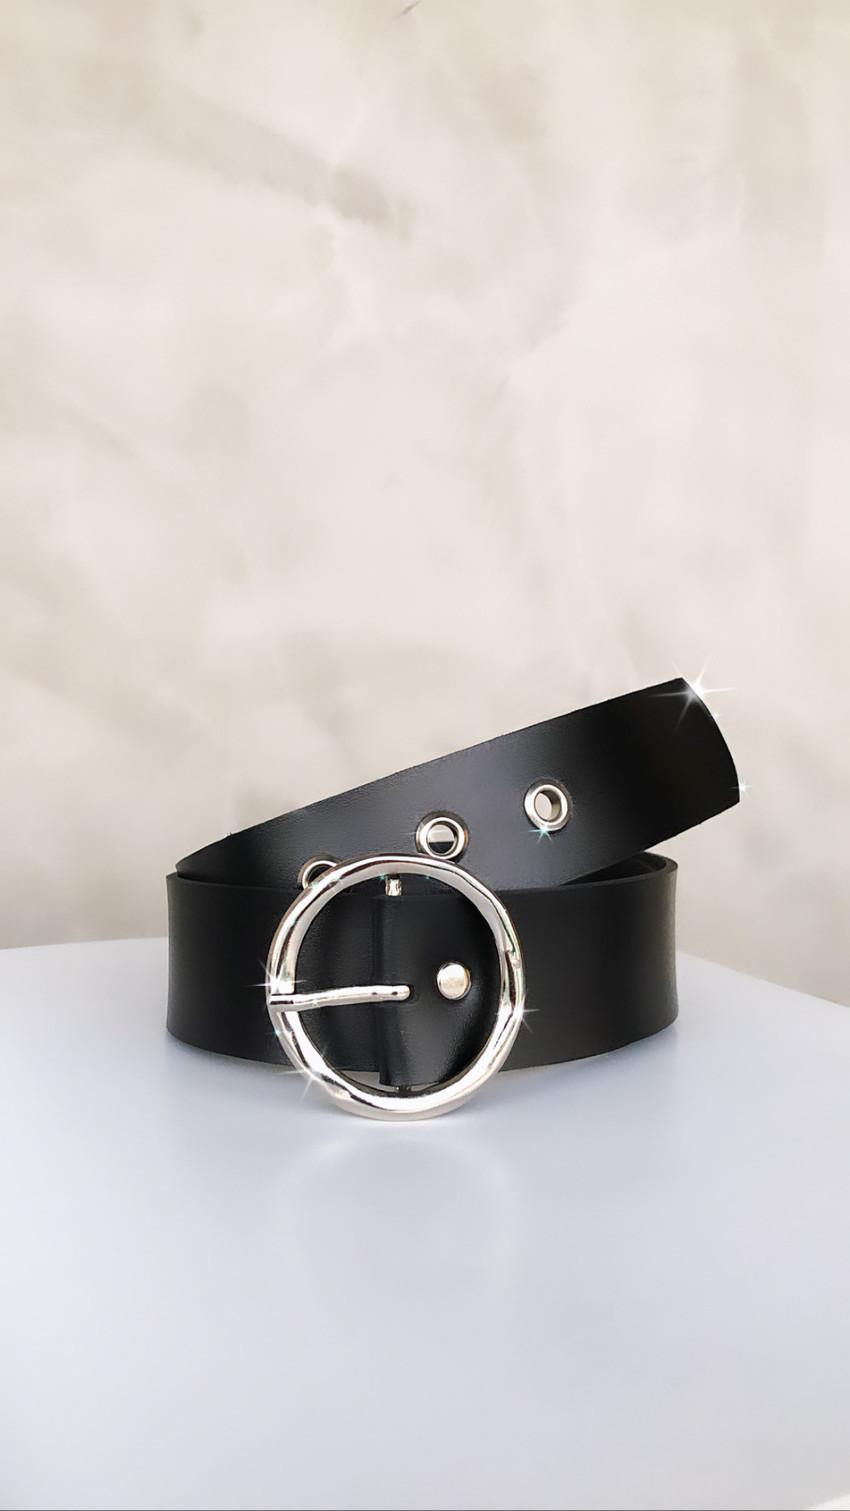 New Black Belt